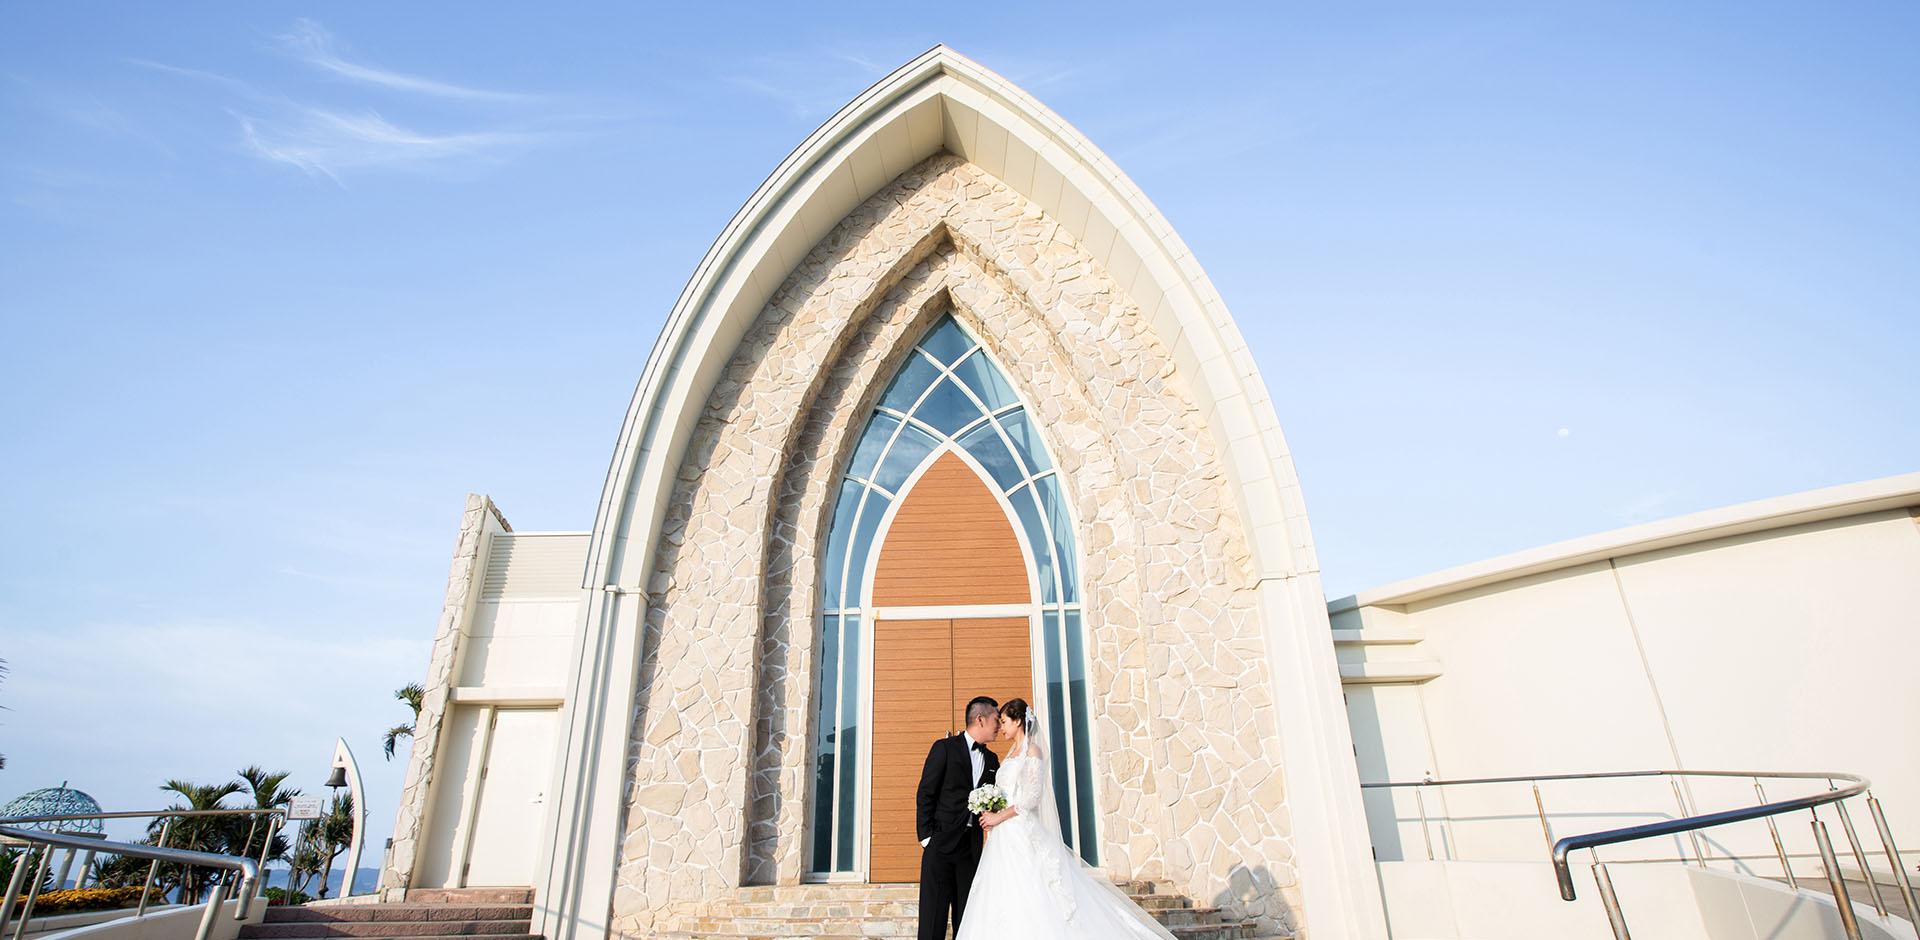 PHOTO SESSION 海外婚纱摄影